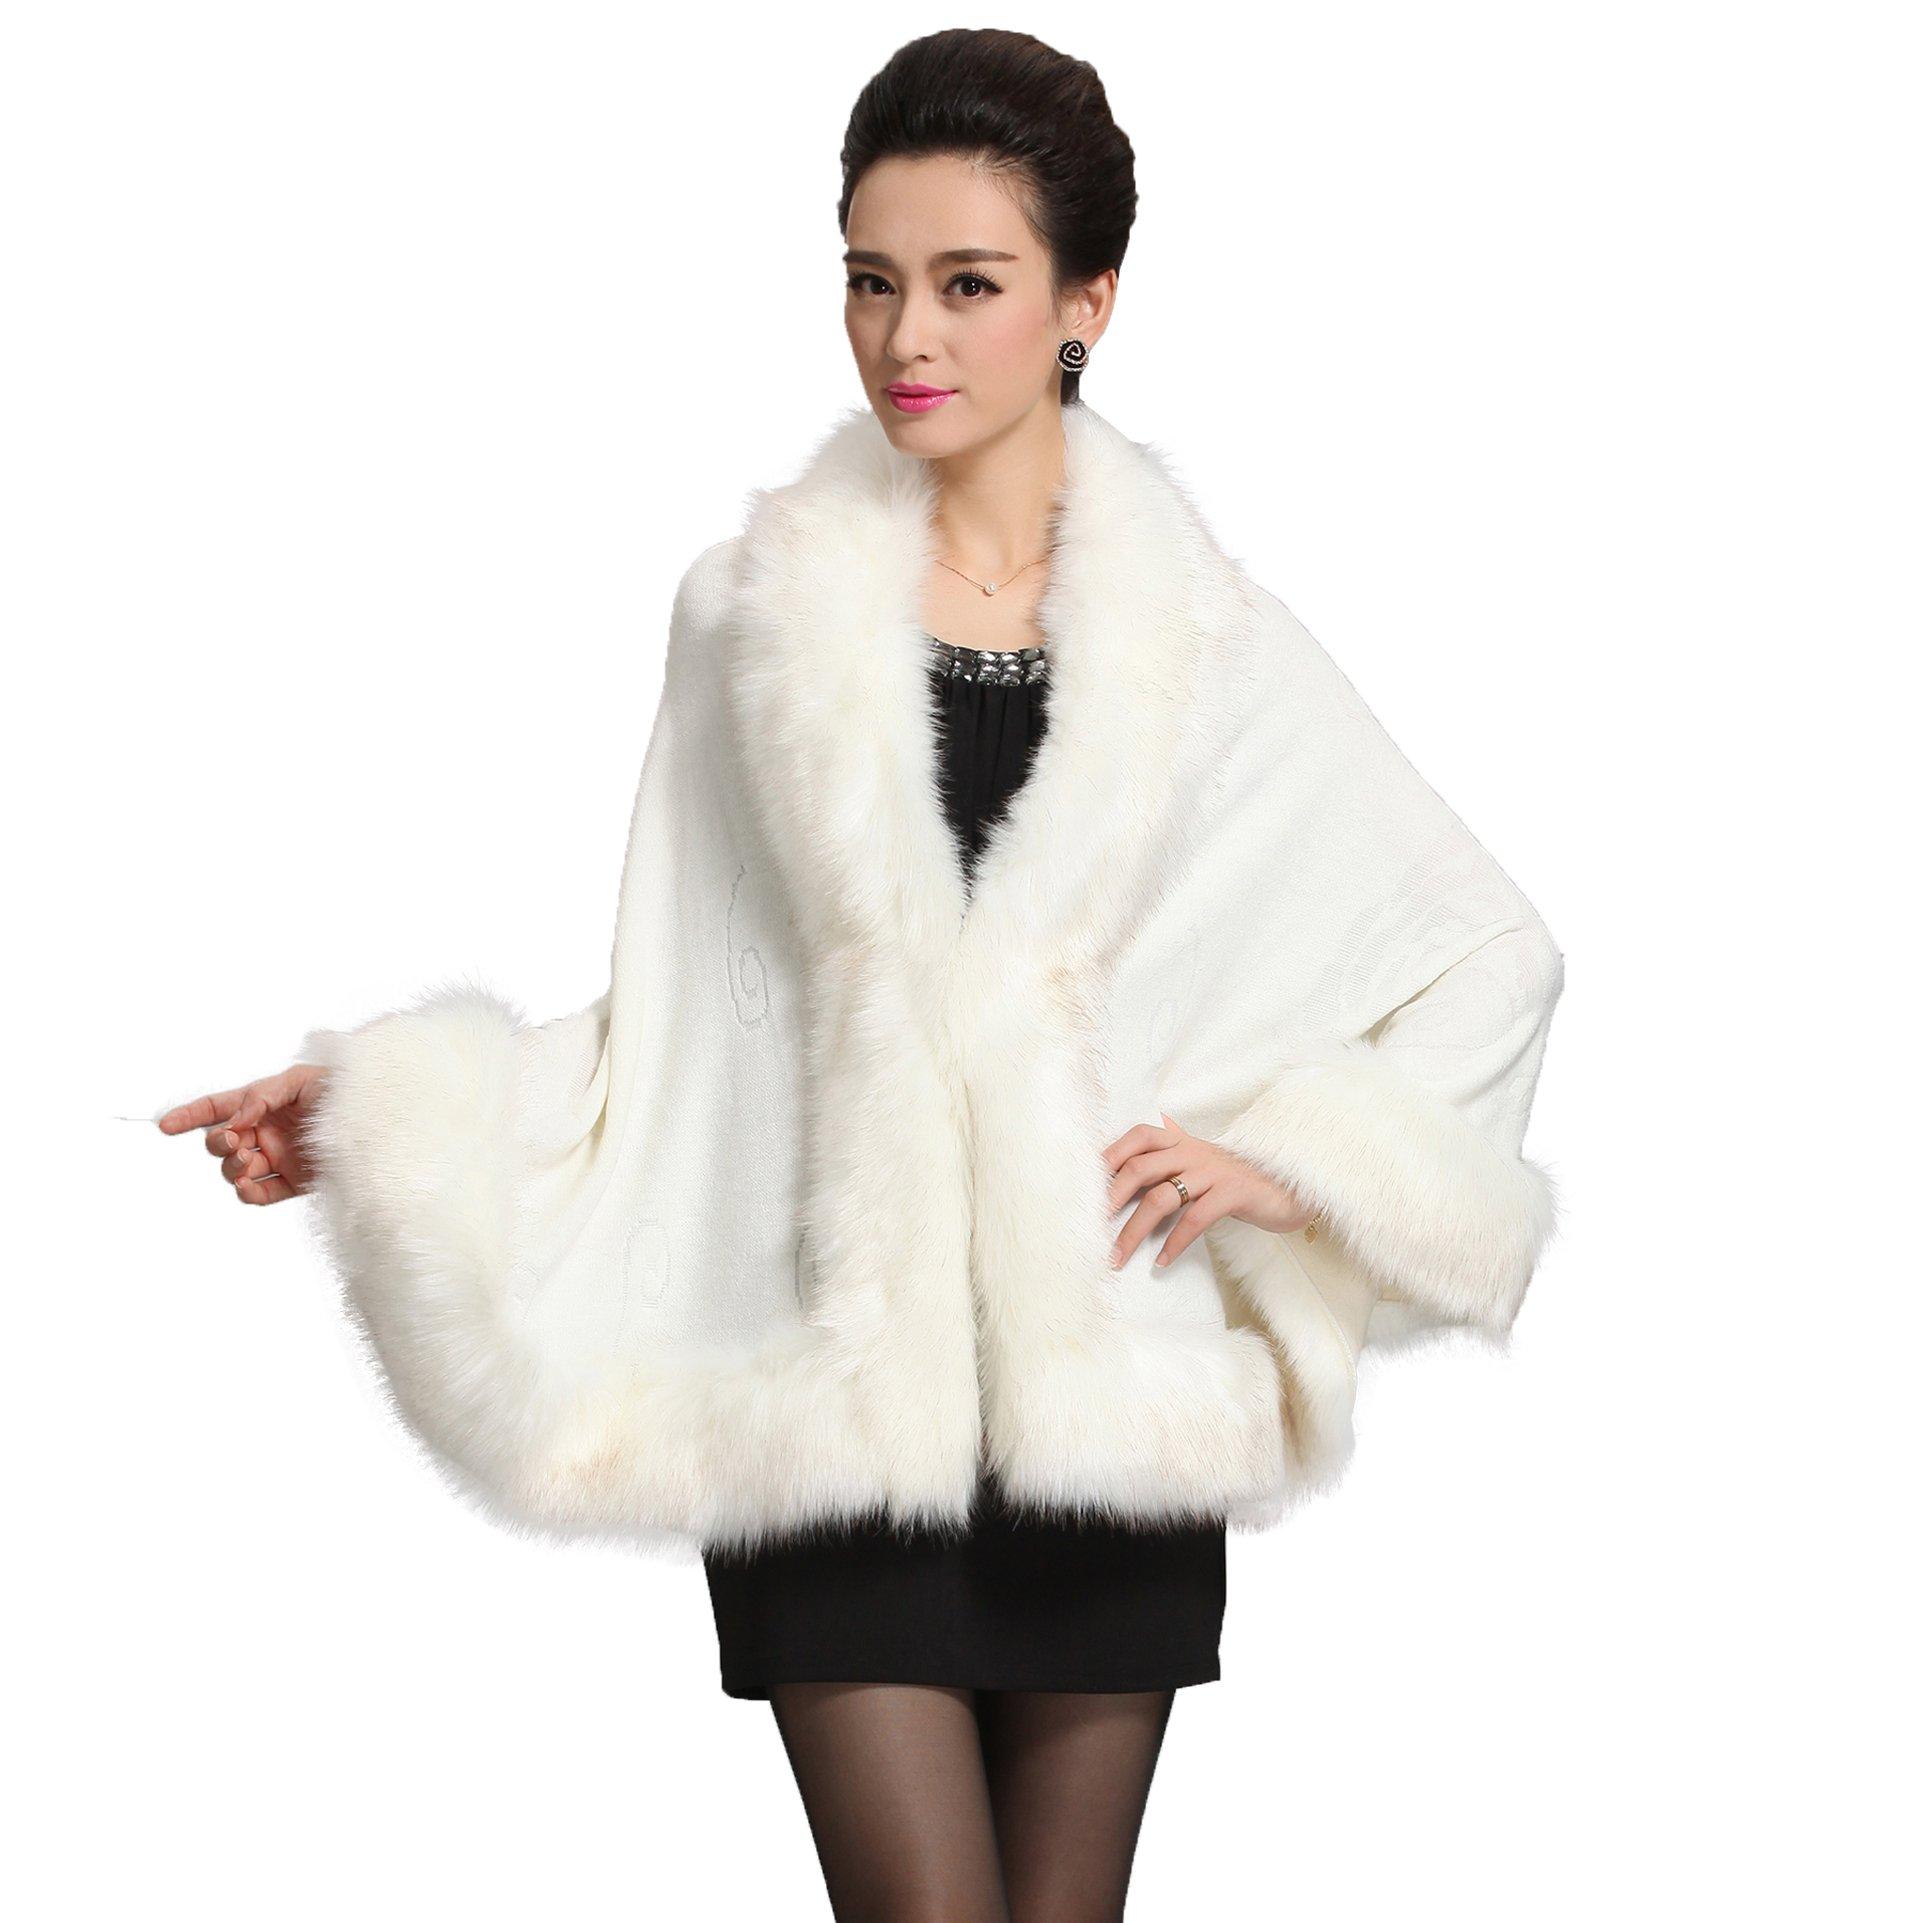 Caracilia Women Bridal Faux Fur Shawl Wraps Cloak Coat Sweater,White,One Size